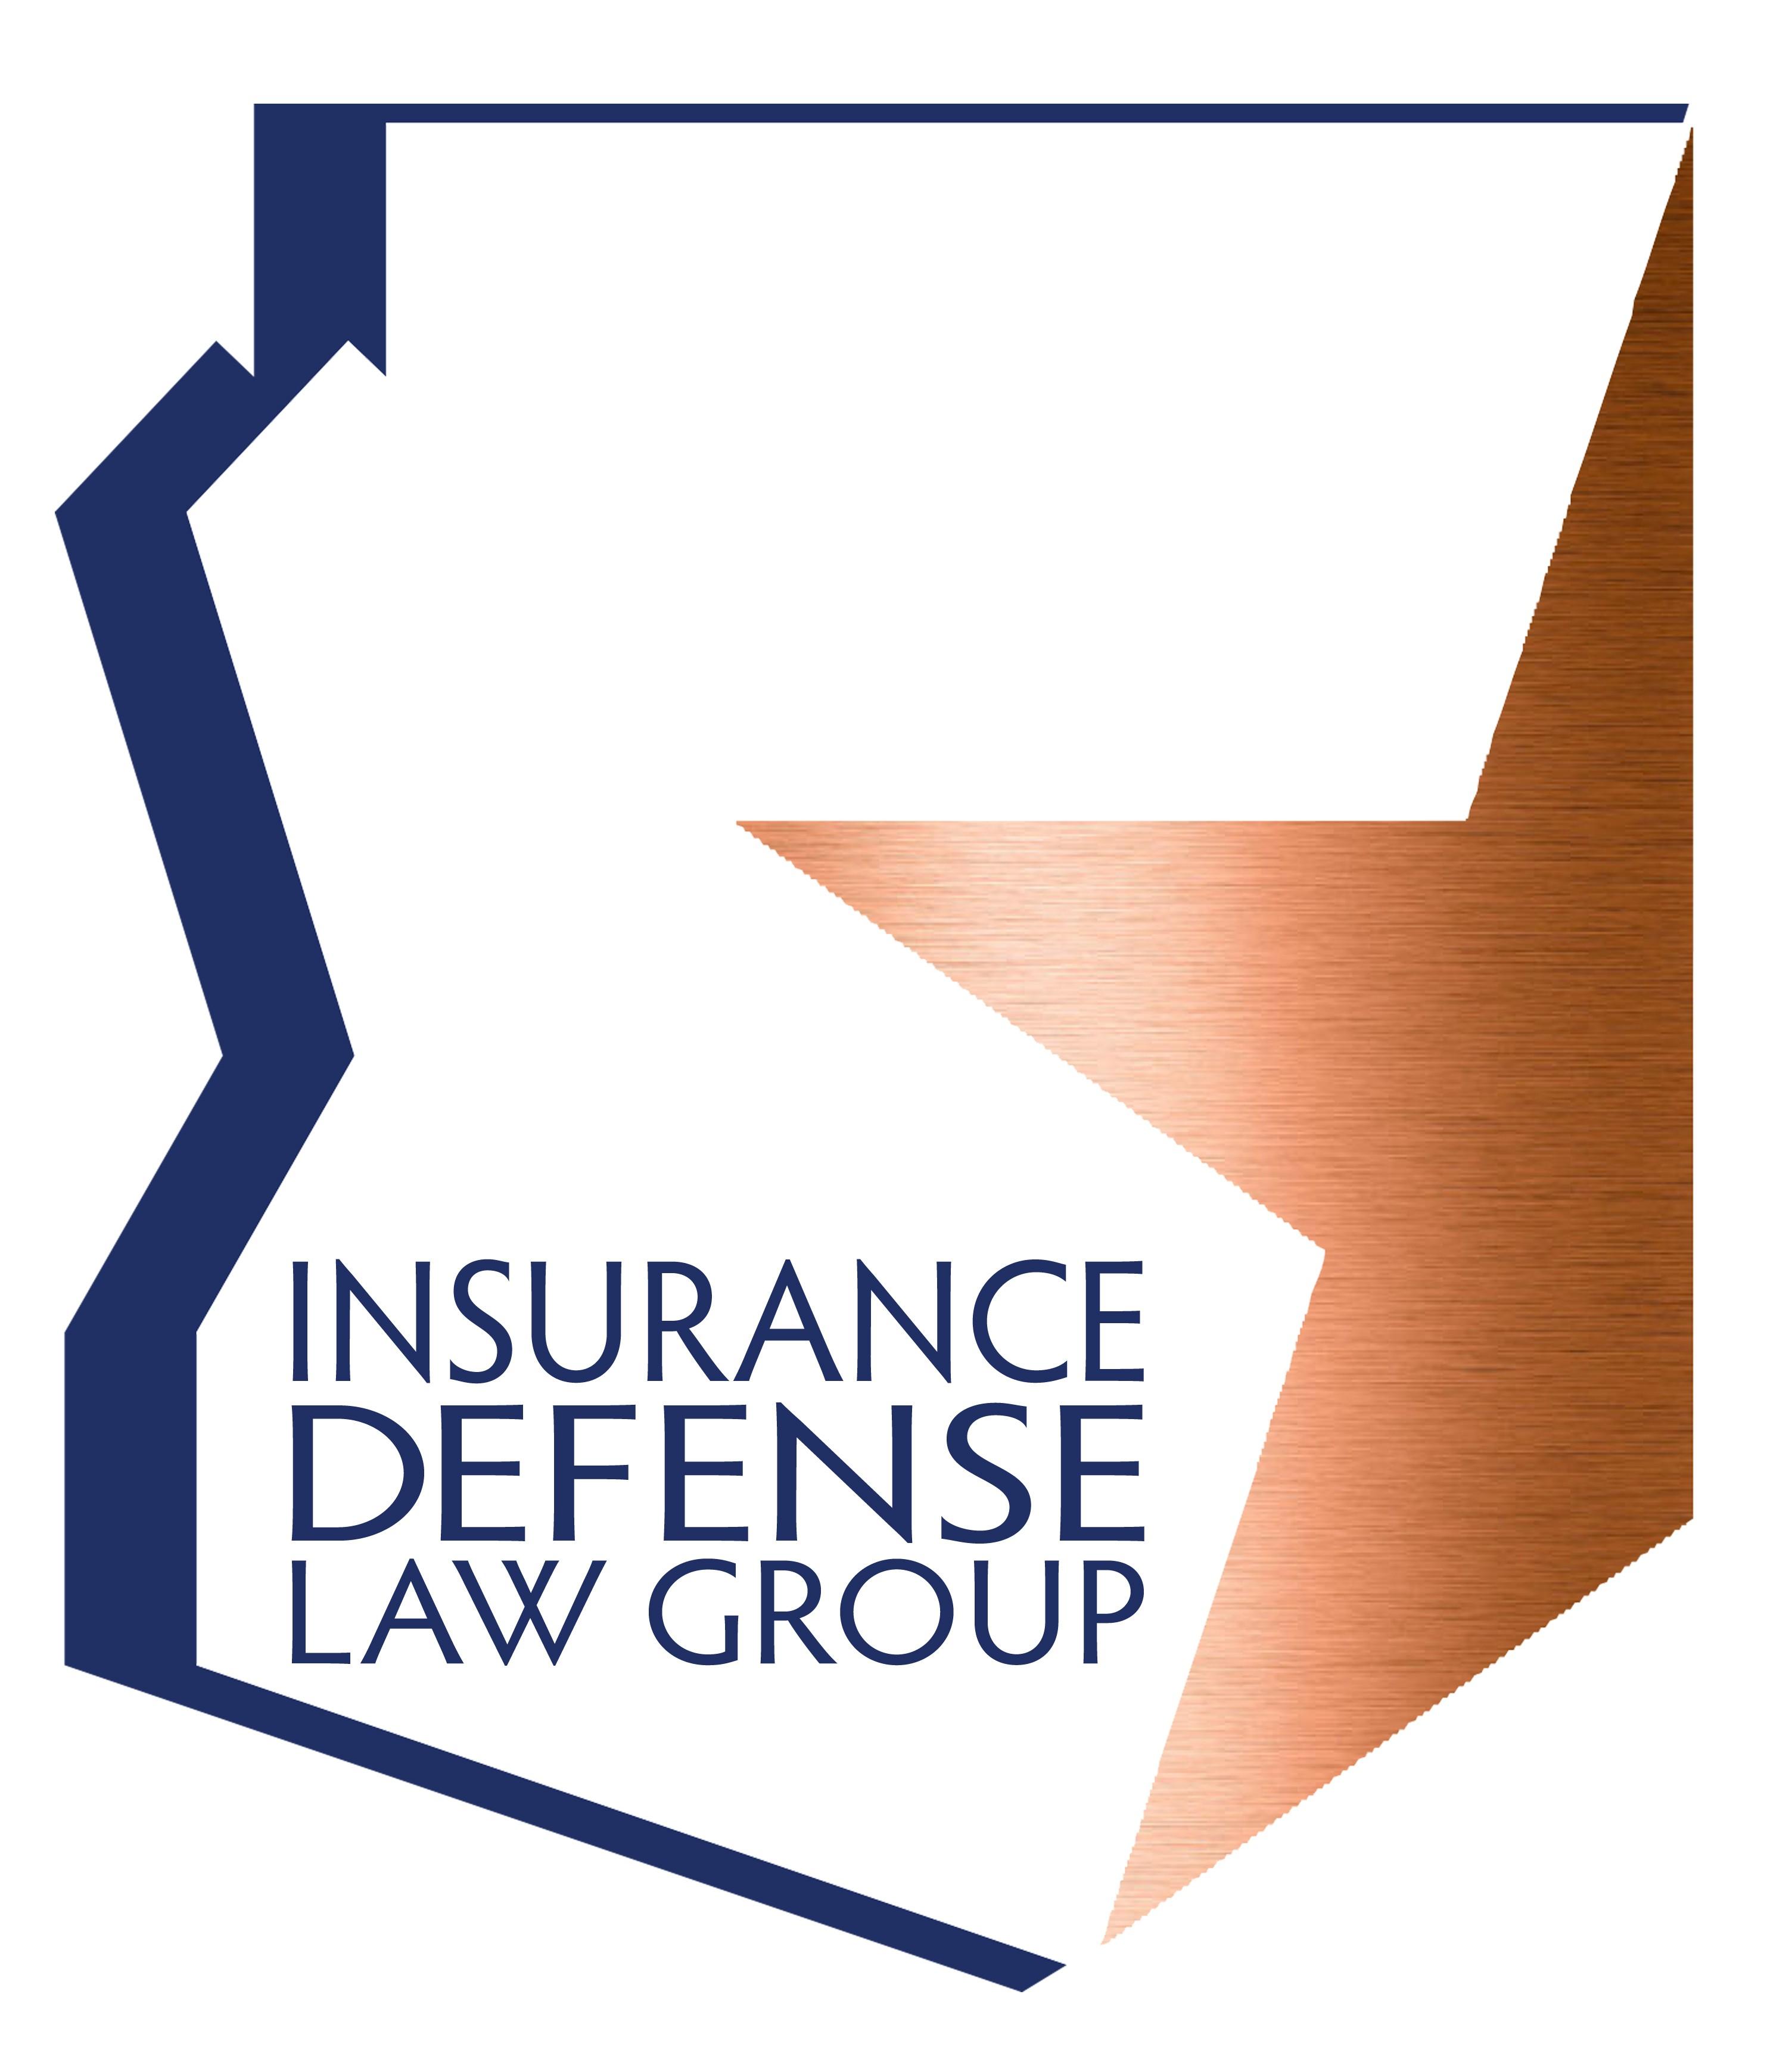 Insurance Defense Law Group L L C Linkedin